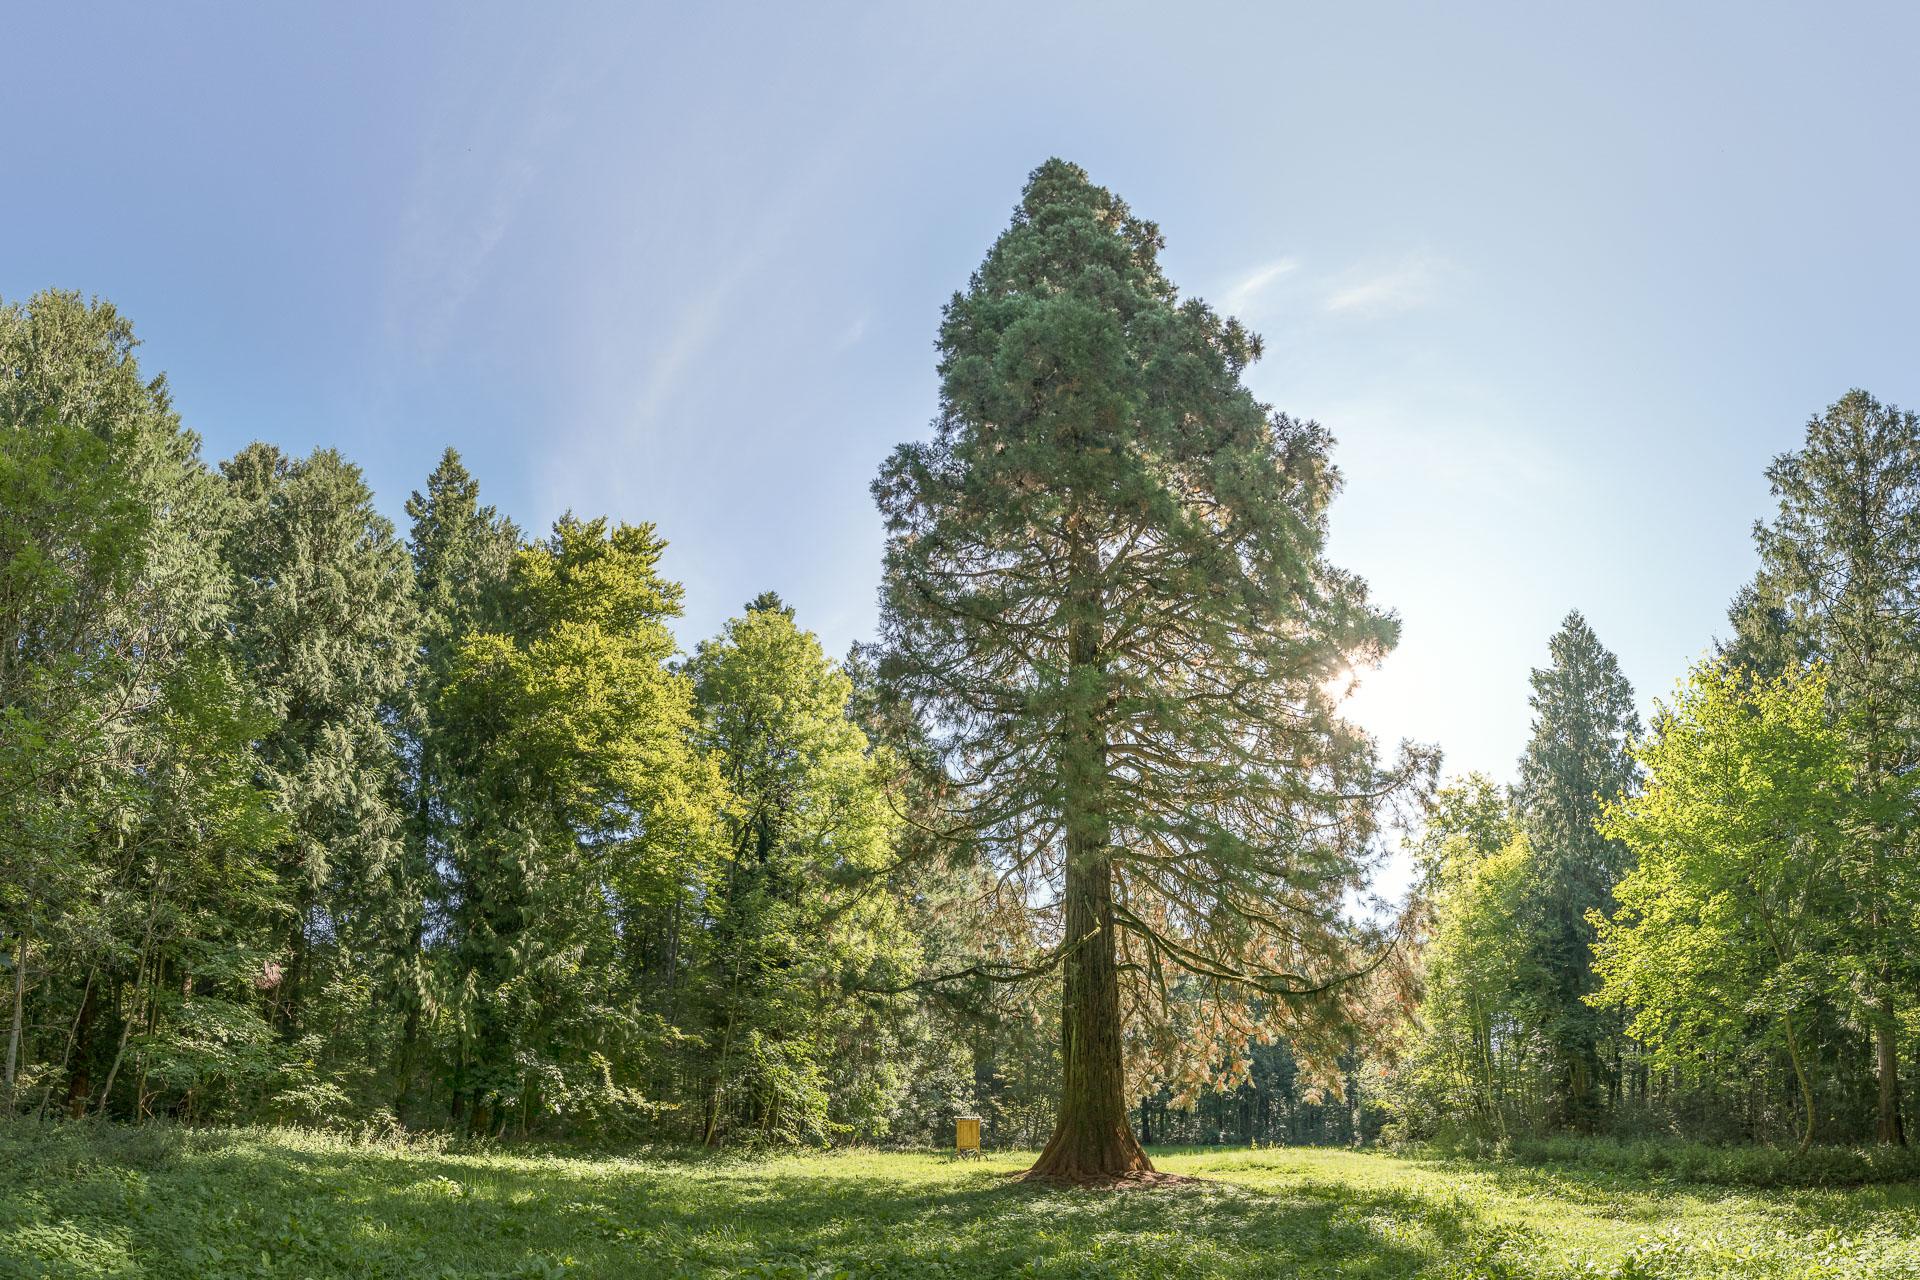 Riesenmammutbaum (Naturdenkmal)